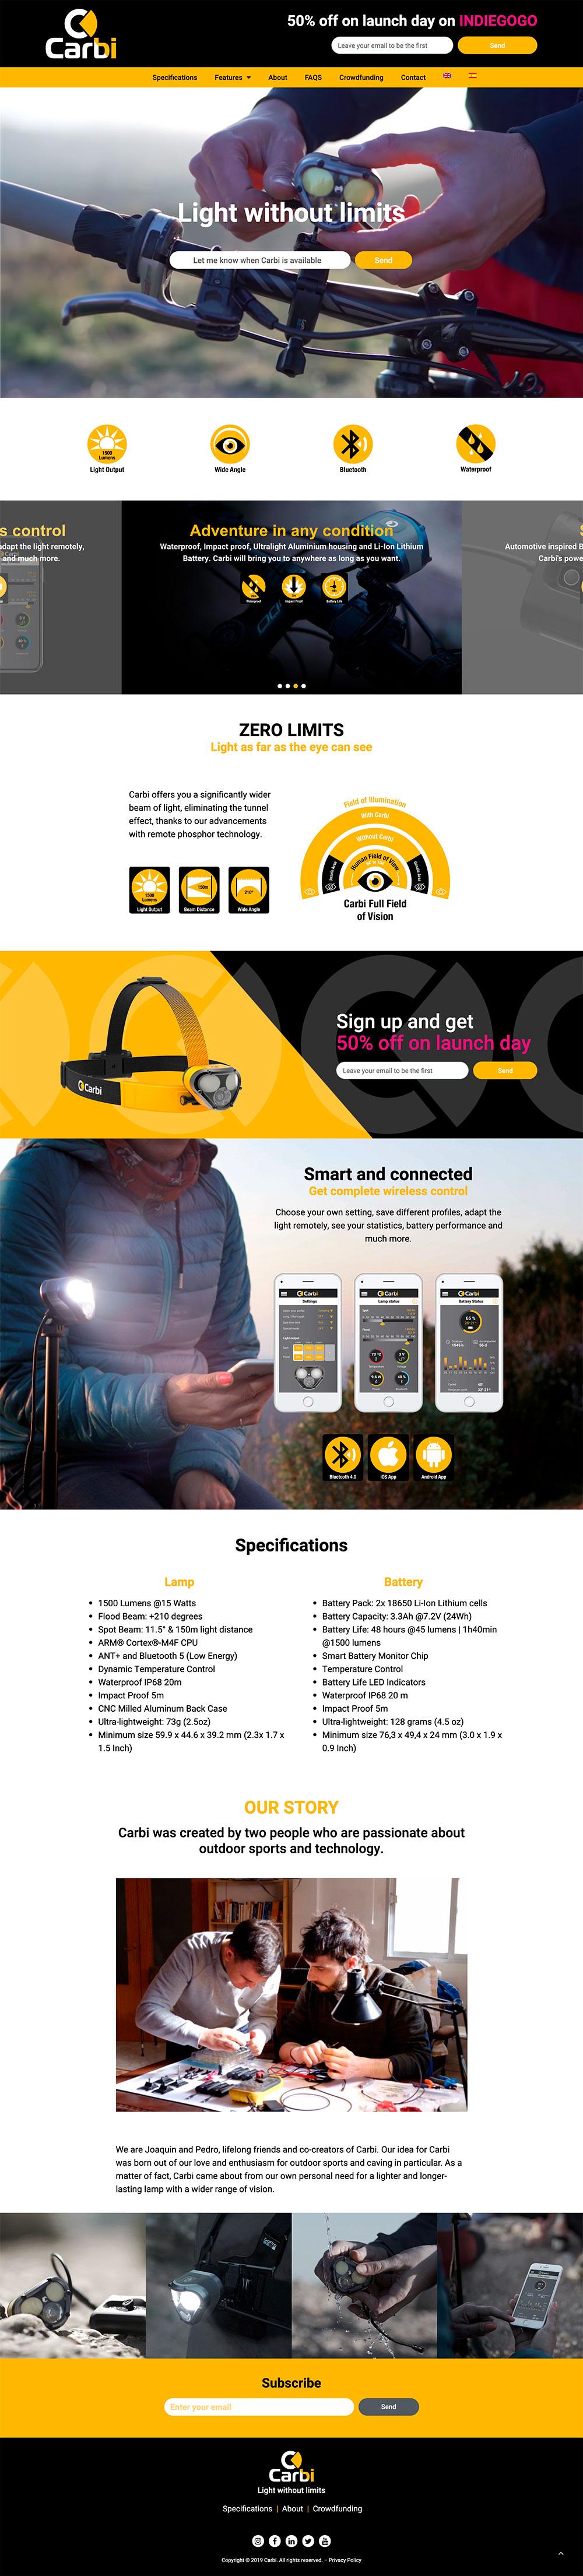 Brandall Agency Carbi Website Page Design